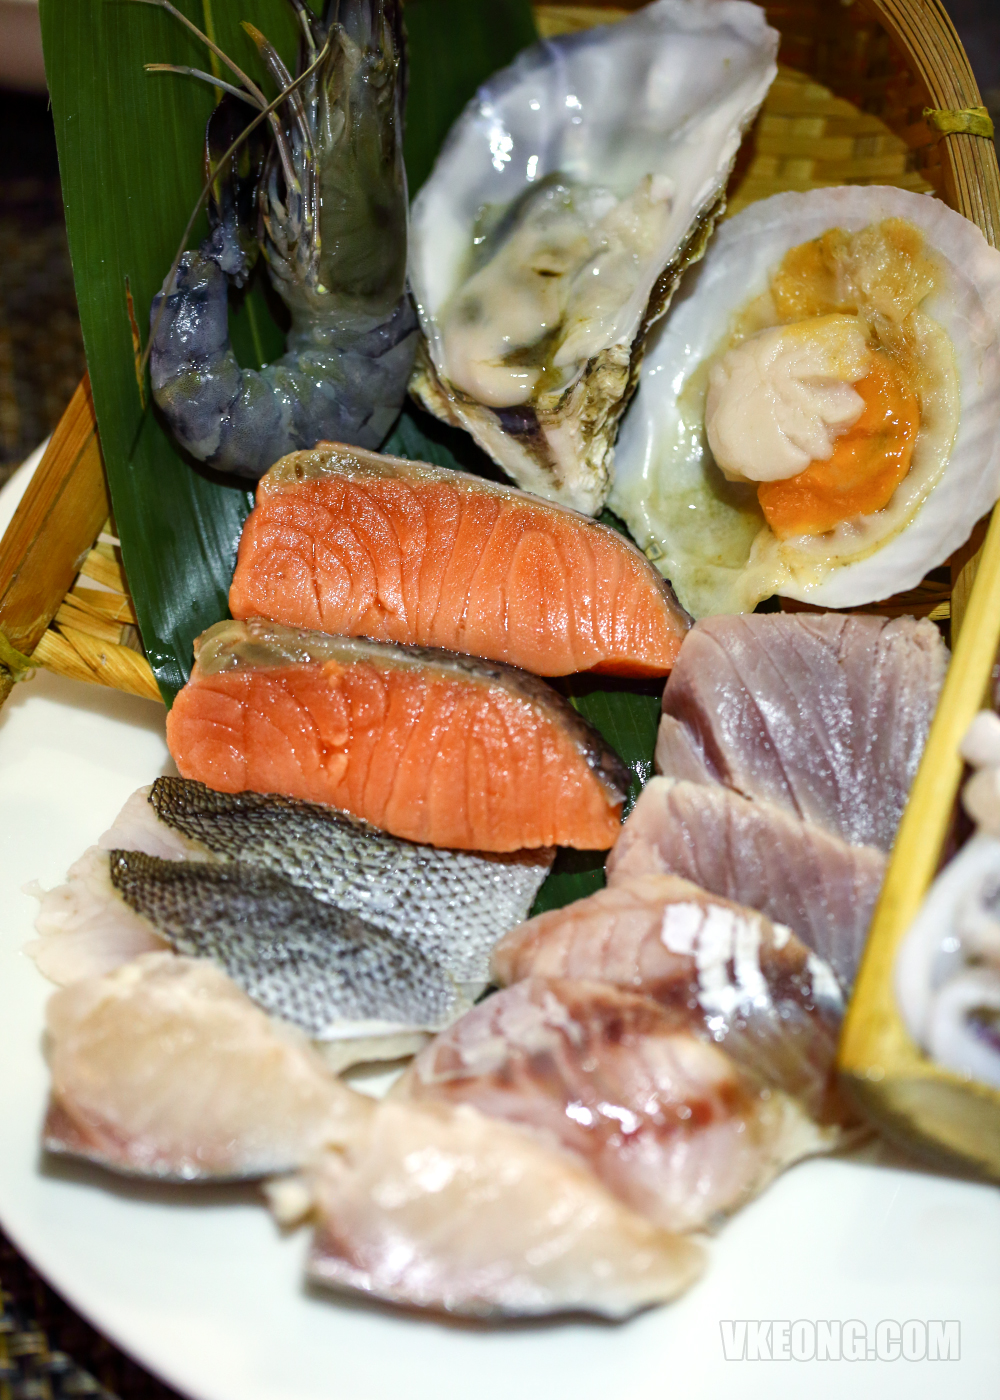 Kurata-Shabu-Shabu-Buffet-Seafood